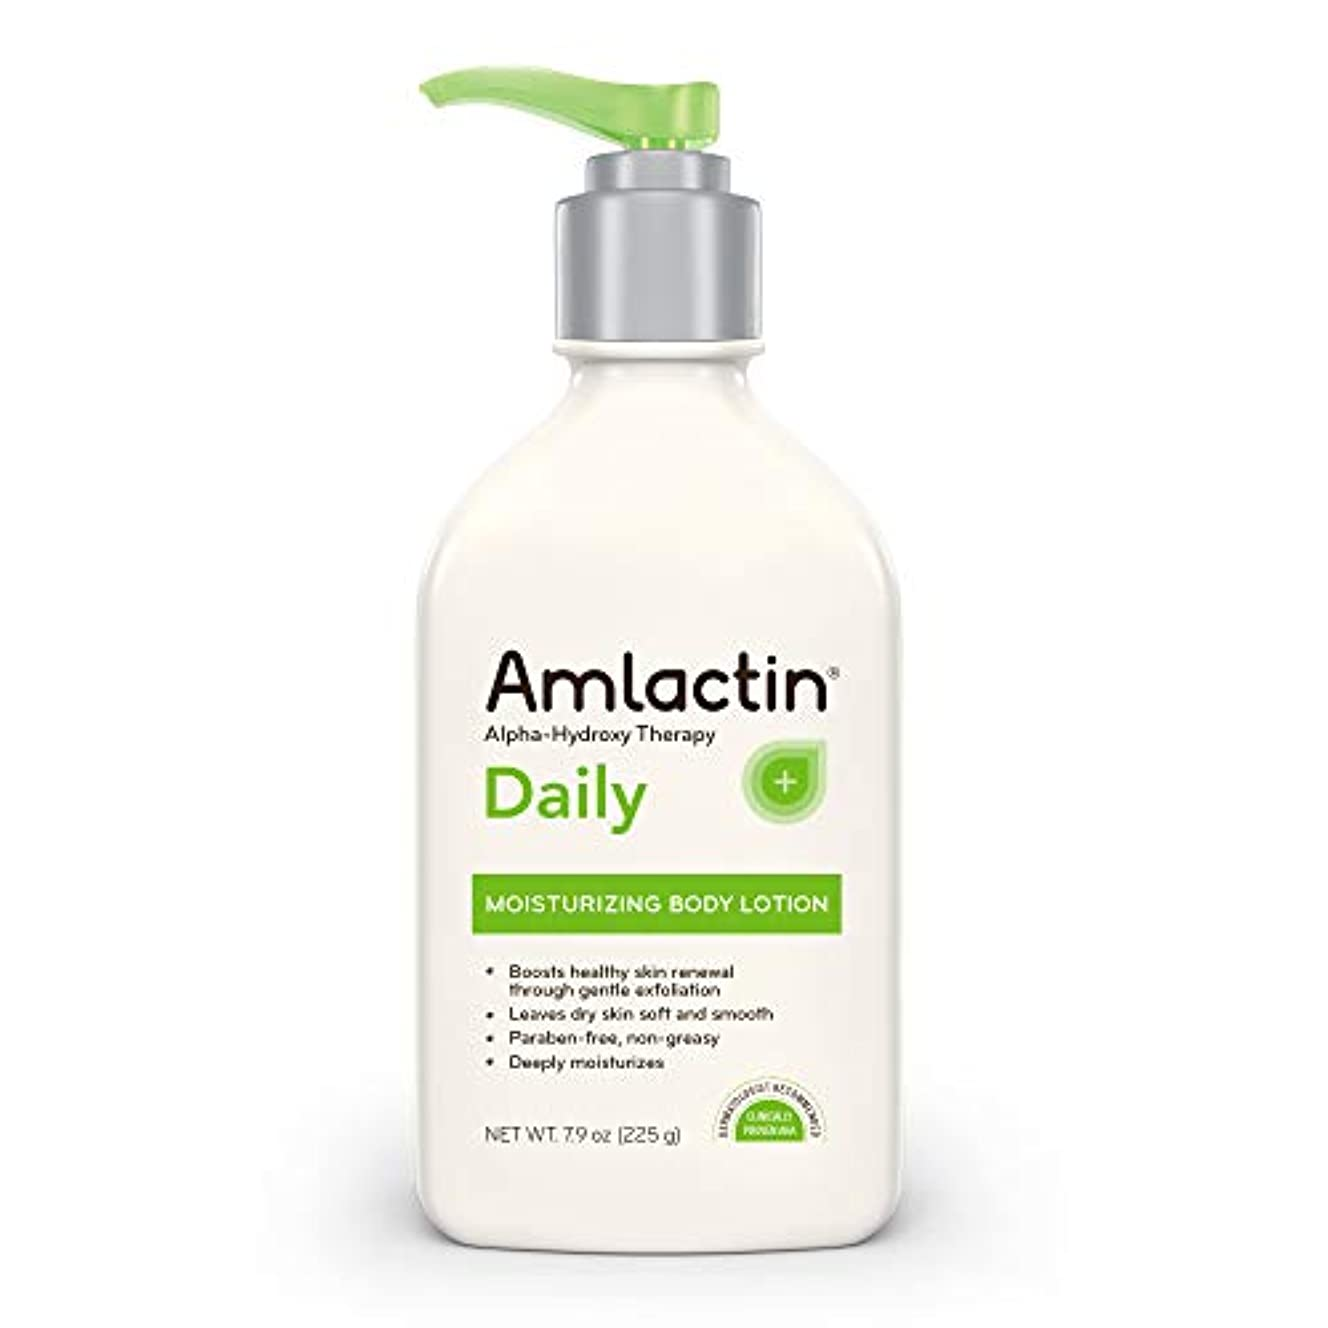 AmLactin デイリーモイスチャライジング ボディローション 瞬時に水分補給 粗さを和らげる 強力なアルファヒドロキシセラピー 優しく体を拡散 粗く滑らか ドライスキン パラベンフリー 7.9オンス